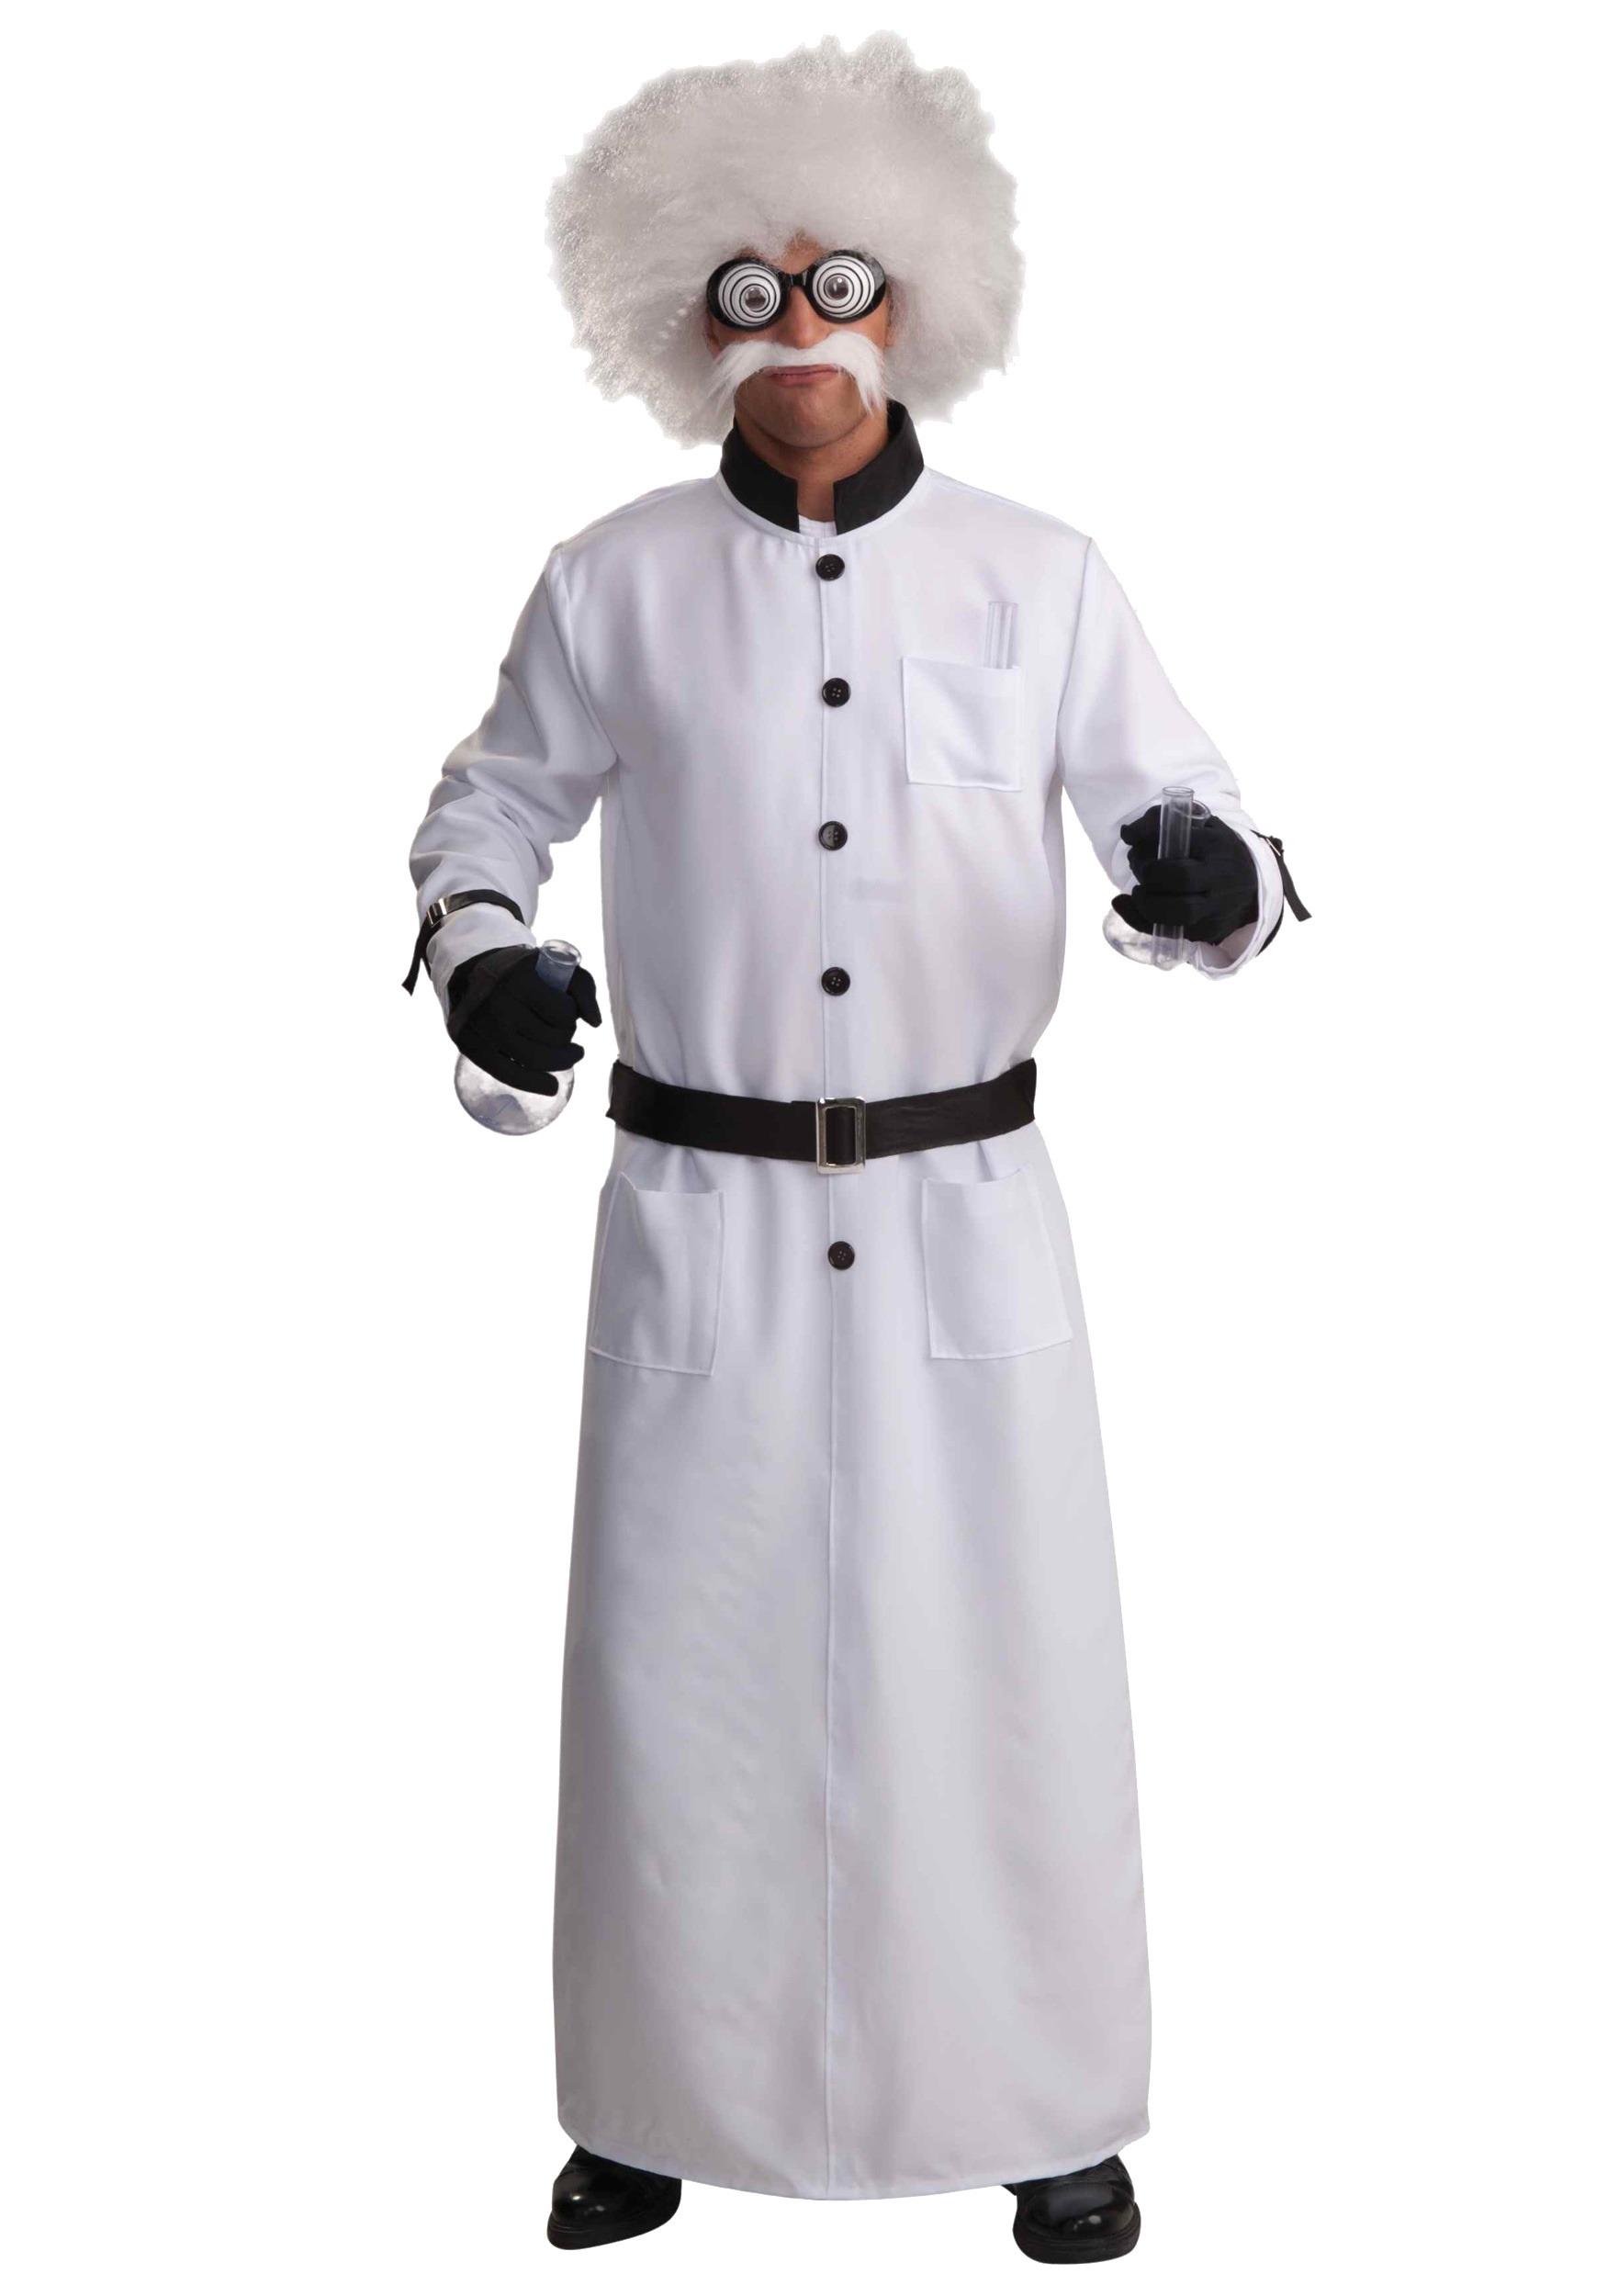 mad scientist costume. Black Bedroom Furniture Sets. Home Design Ideas